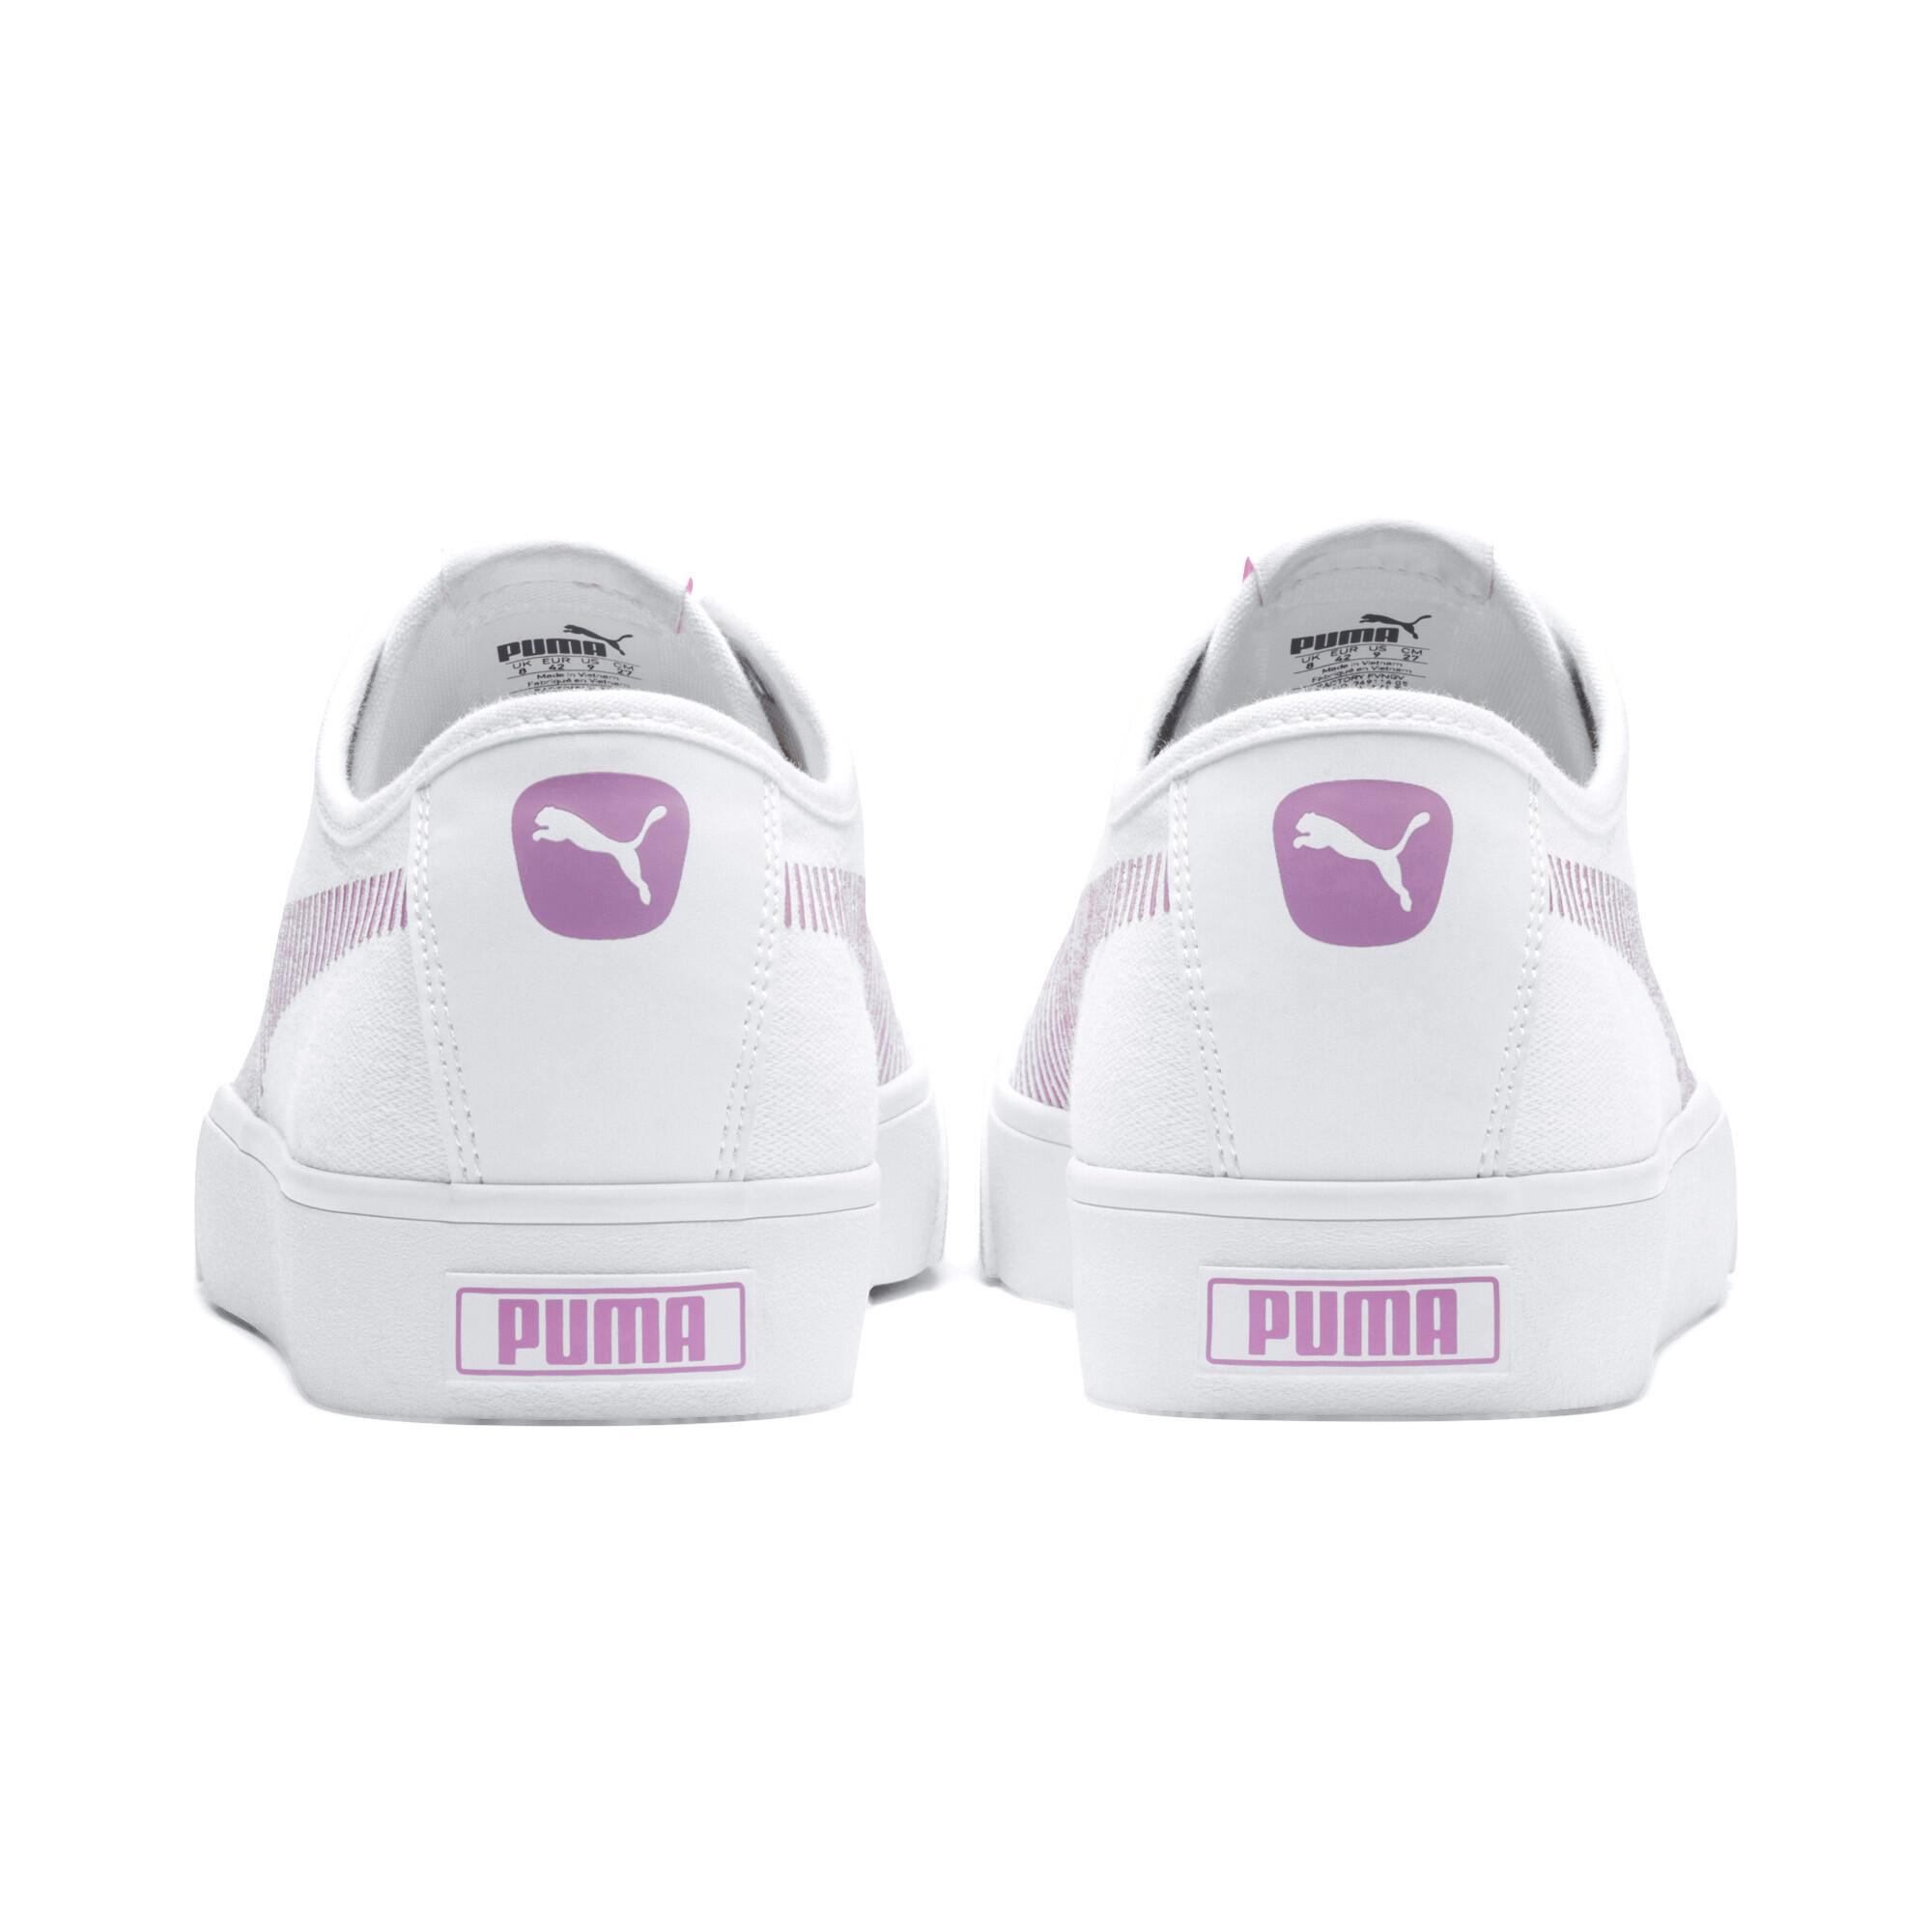 PUMA-Bari-Sneakers-Men-Shoe-Basics thumbnail 7